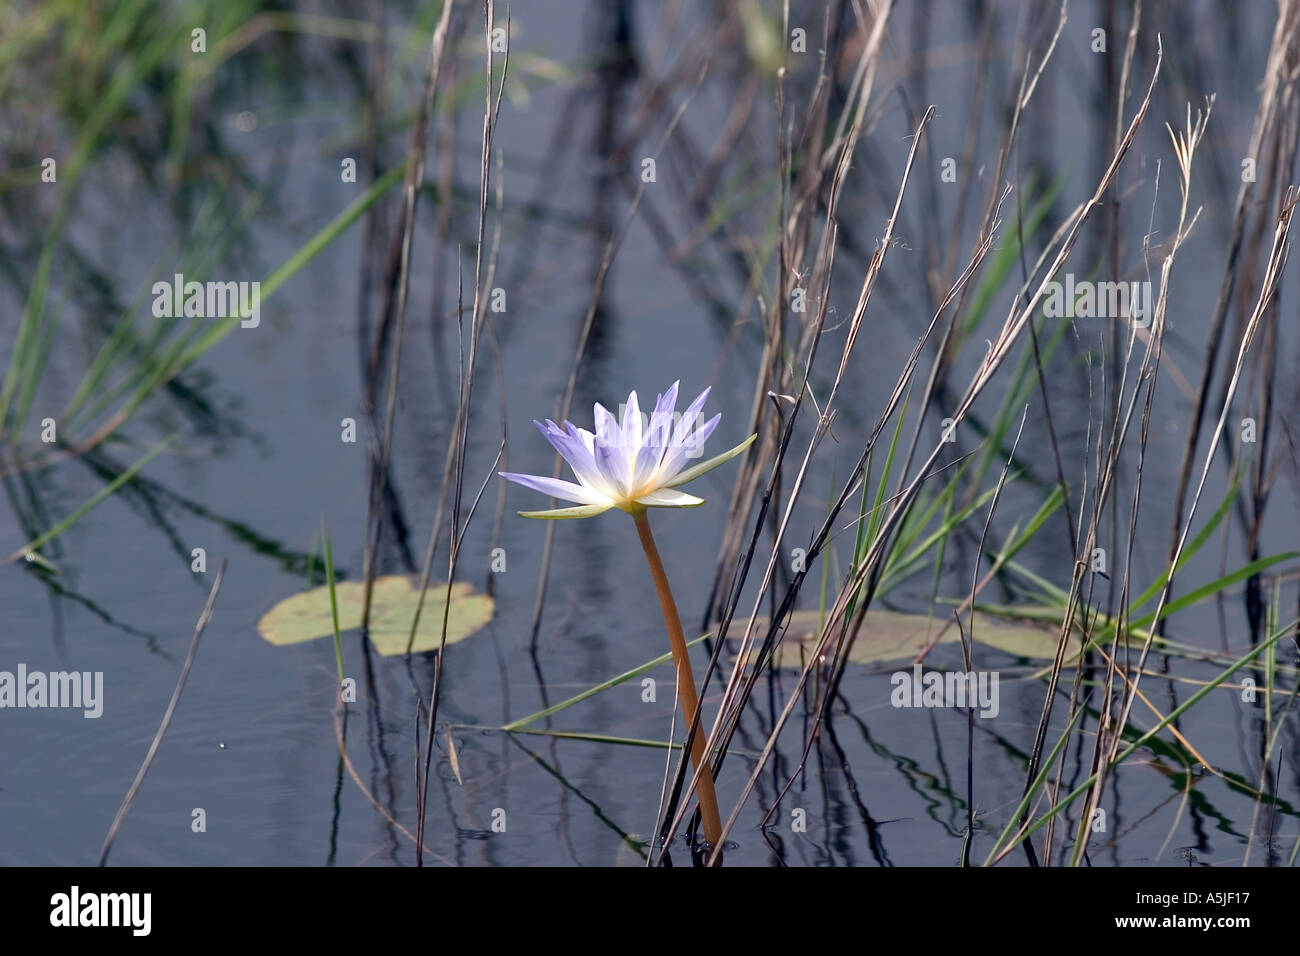 Water Lily Aransas National Wildlife Refuge Austwell Texas USA - Stock Image